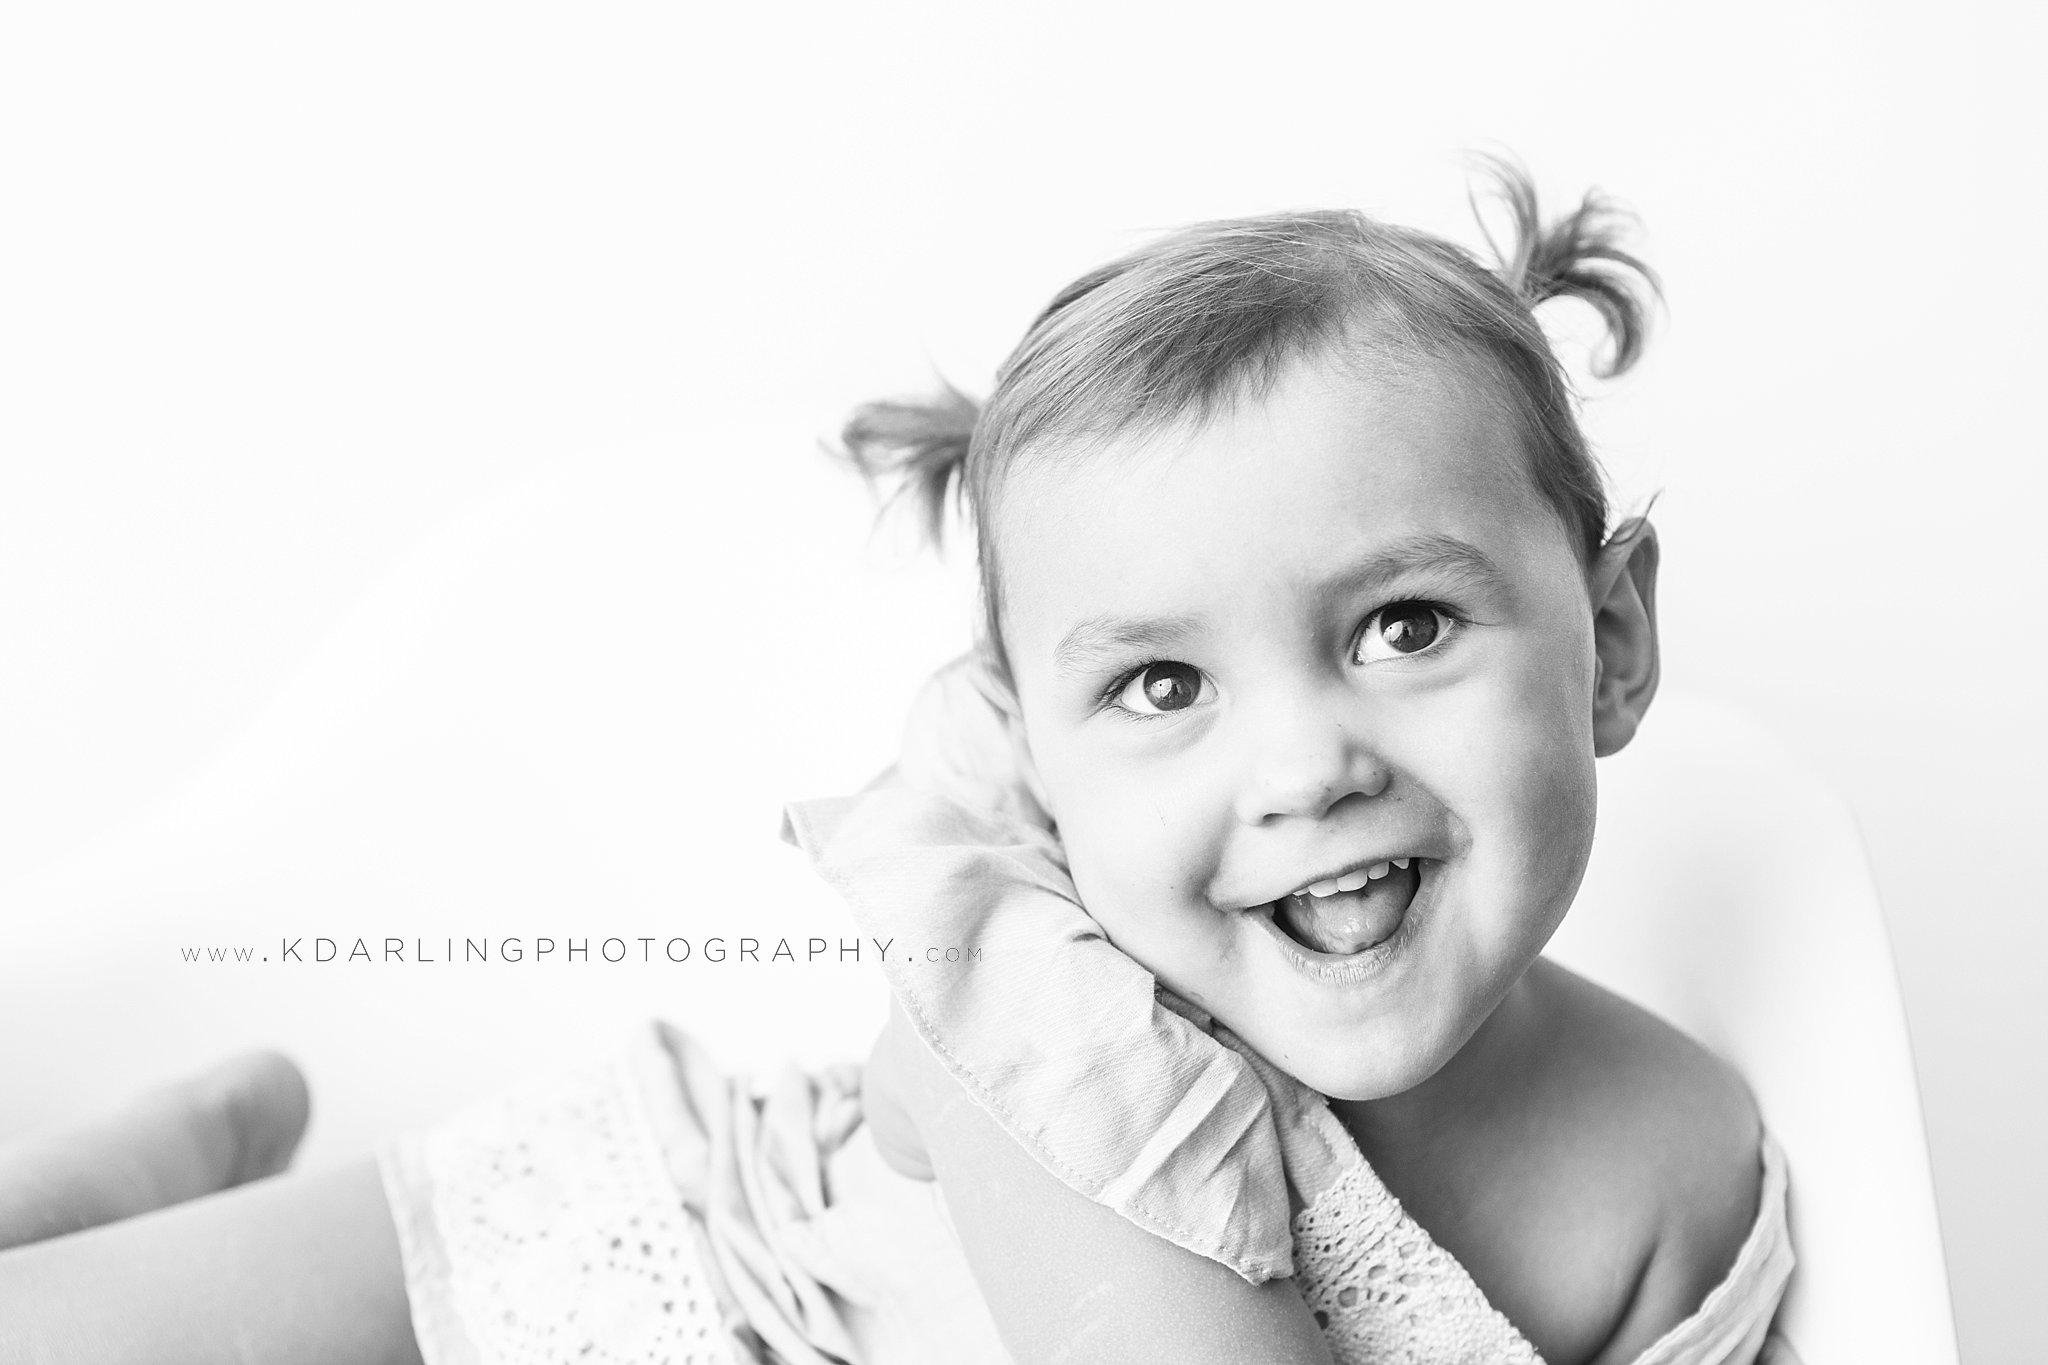 Child-Photographer-portraits-Champaign-County-IL-Fisher-Studio-Darling_0181.jpg